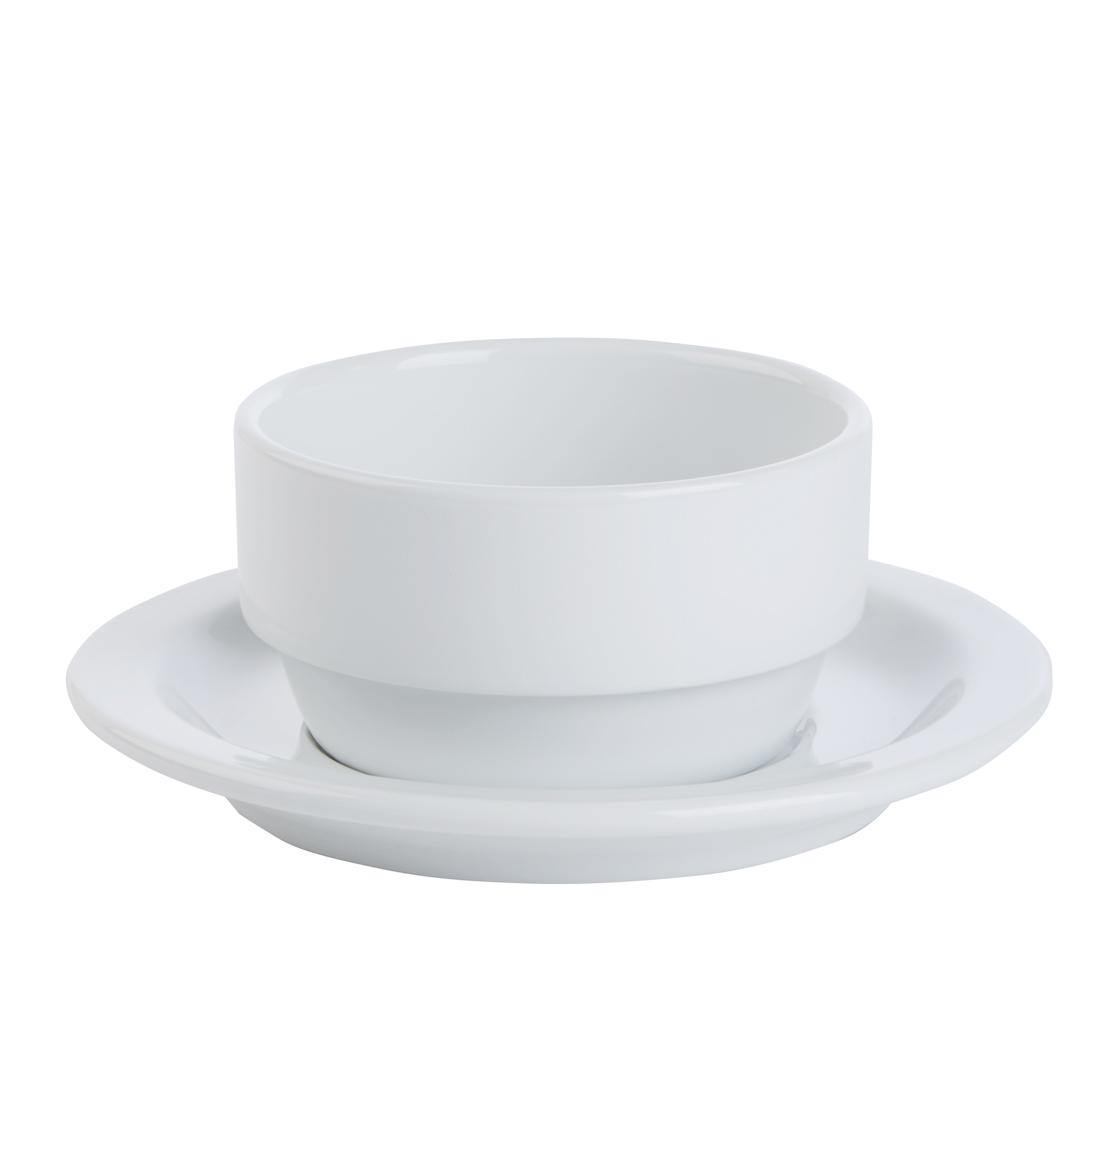 Bowl & Soup Stand/Saucer